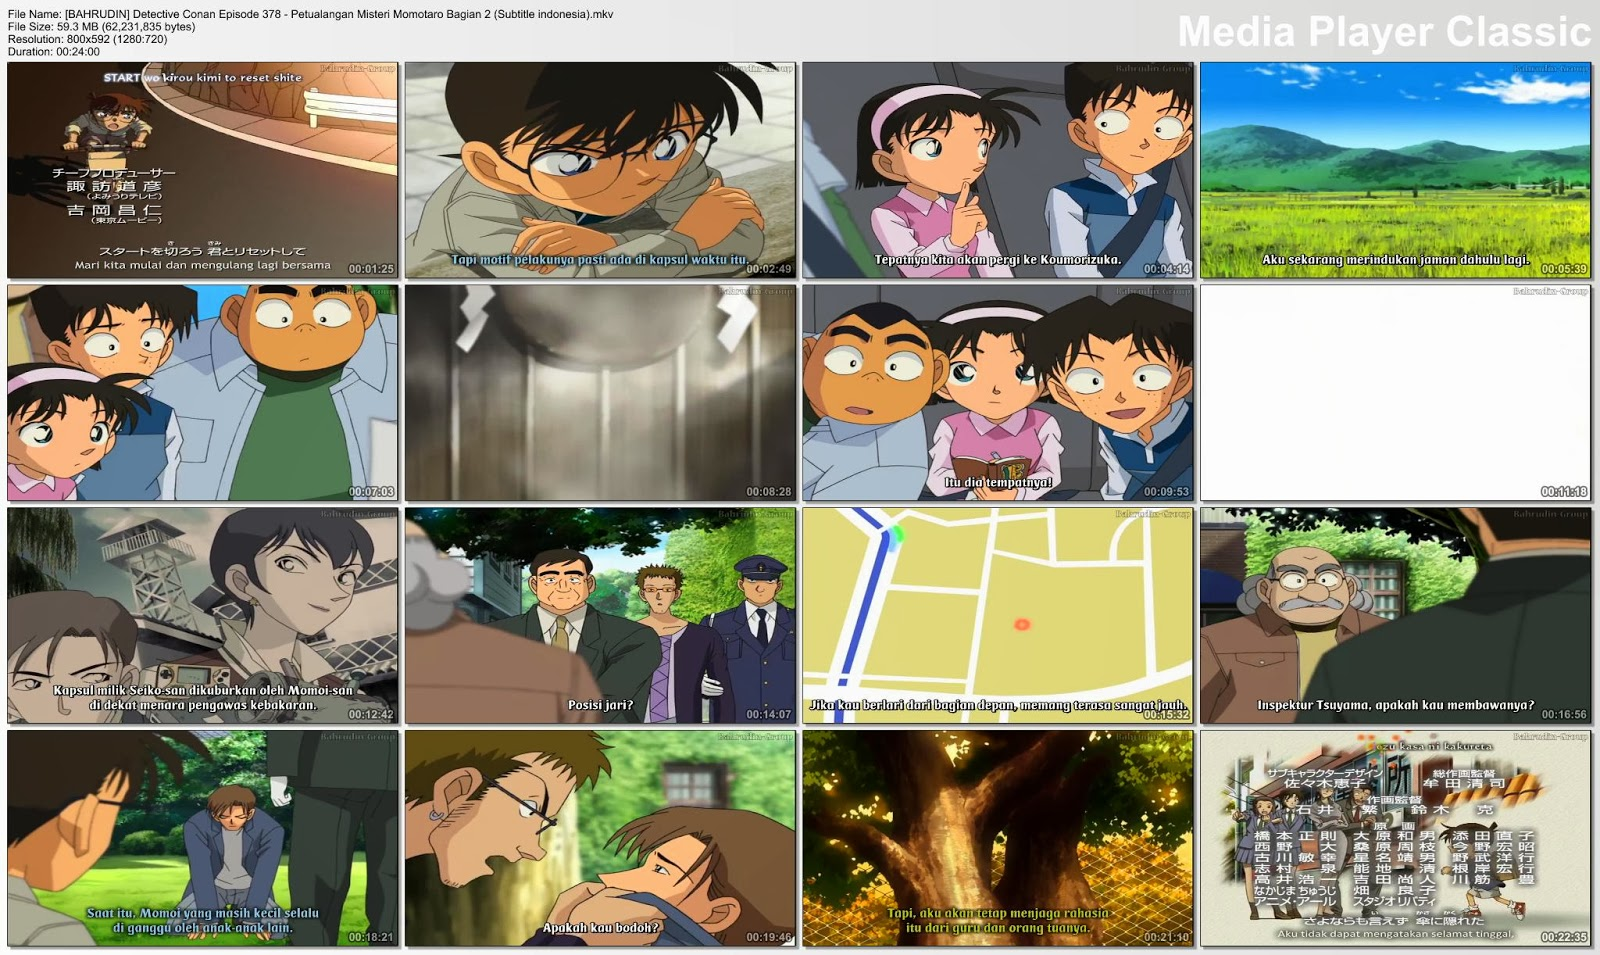 BAHRUDIN] Detective Conan Episode 378 - Petualangan Misteri Momotaro